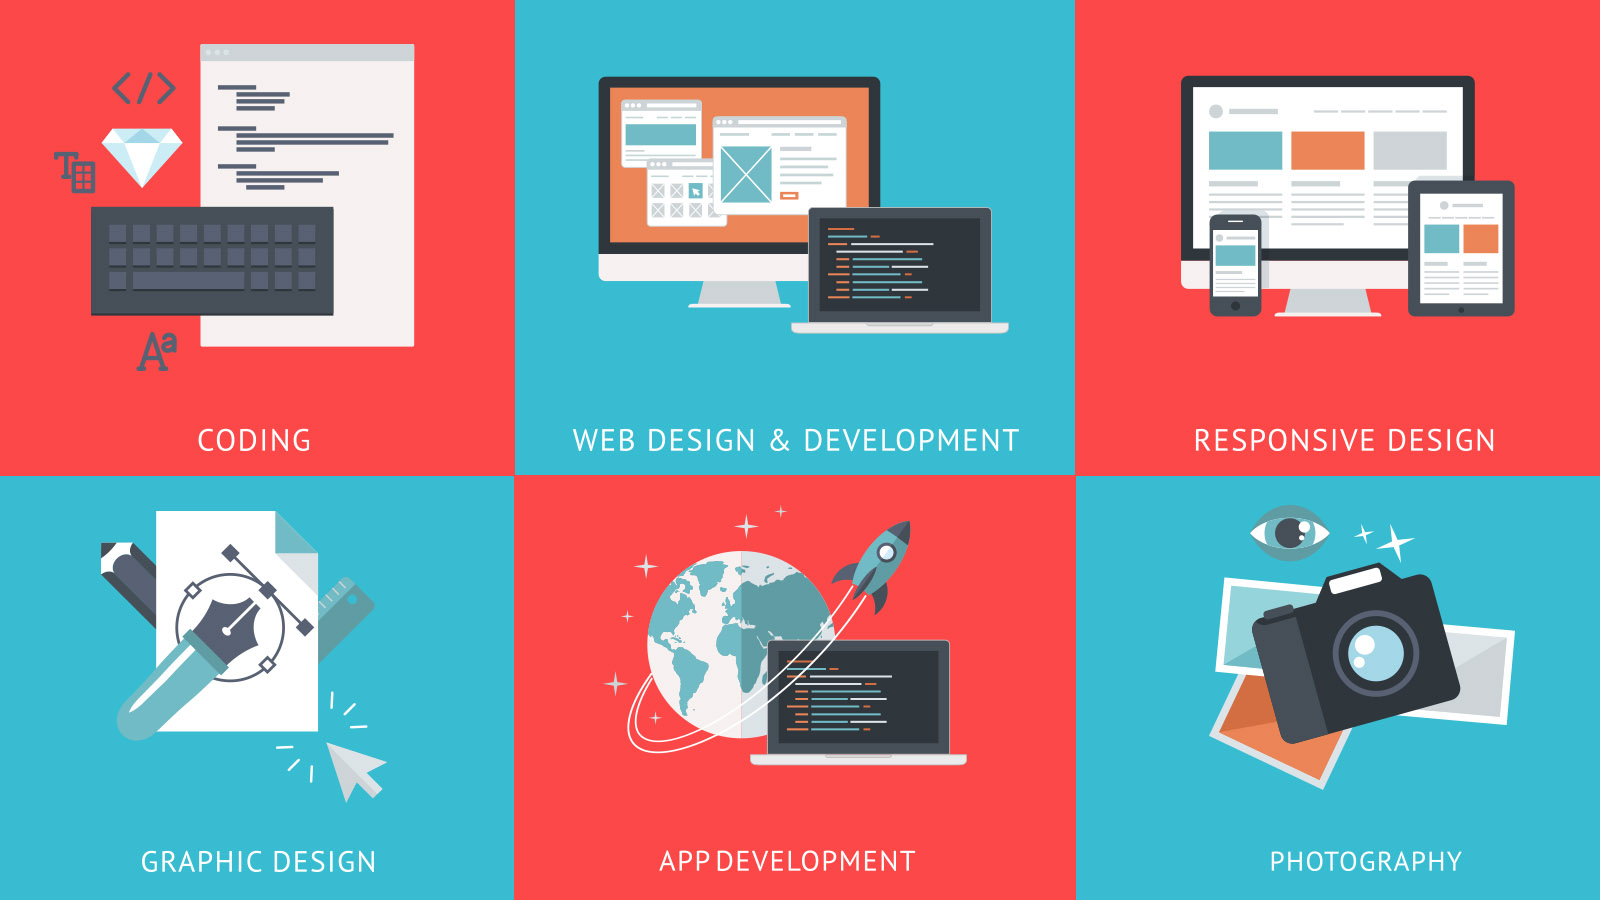 Services: Web Development, Graphic Design, Coding, Responsive Design, Development, Photography